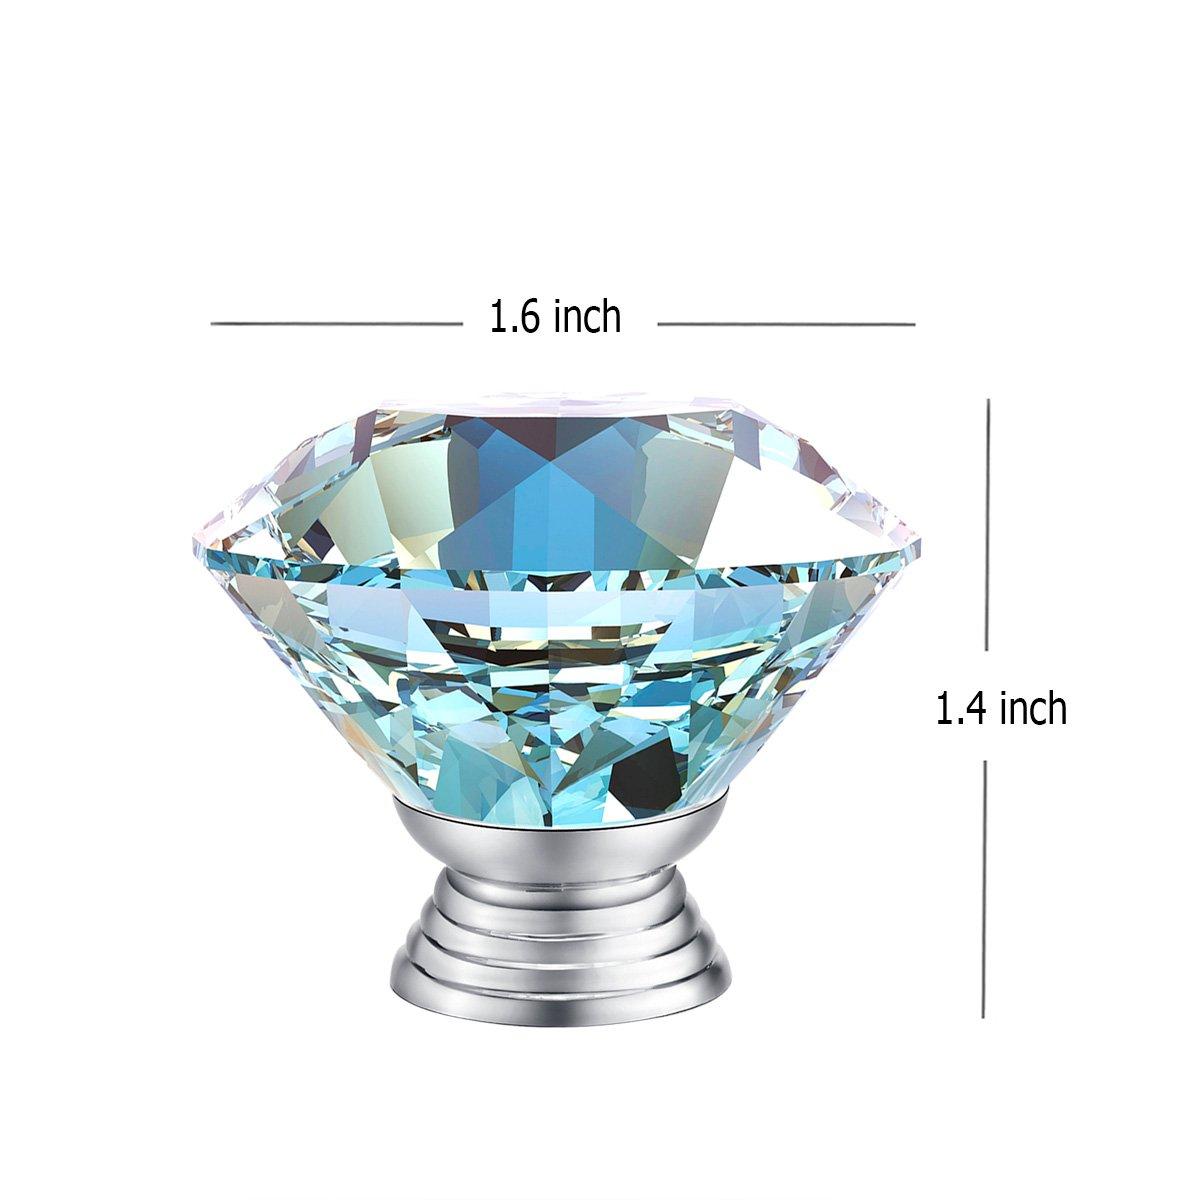 3S 10pcs 40mm Crystal Glass Diamond Shape Cabinet Knob Drawer Pull ...